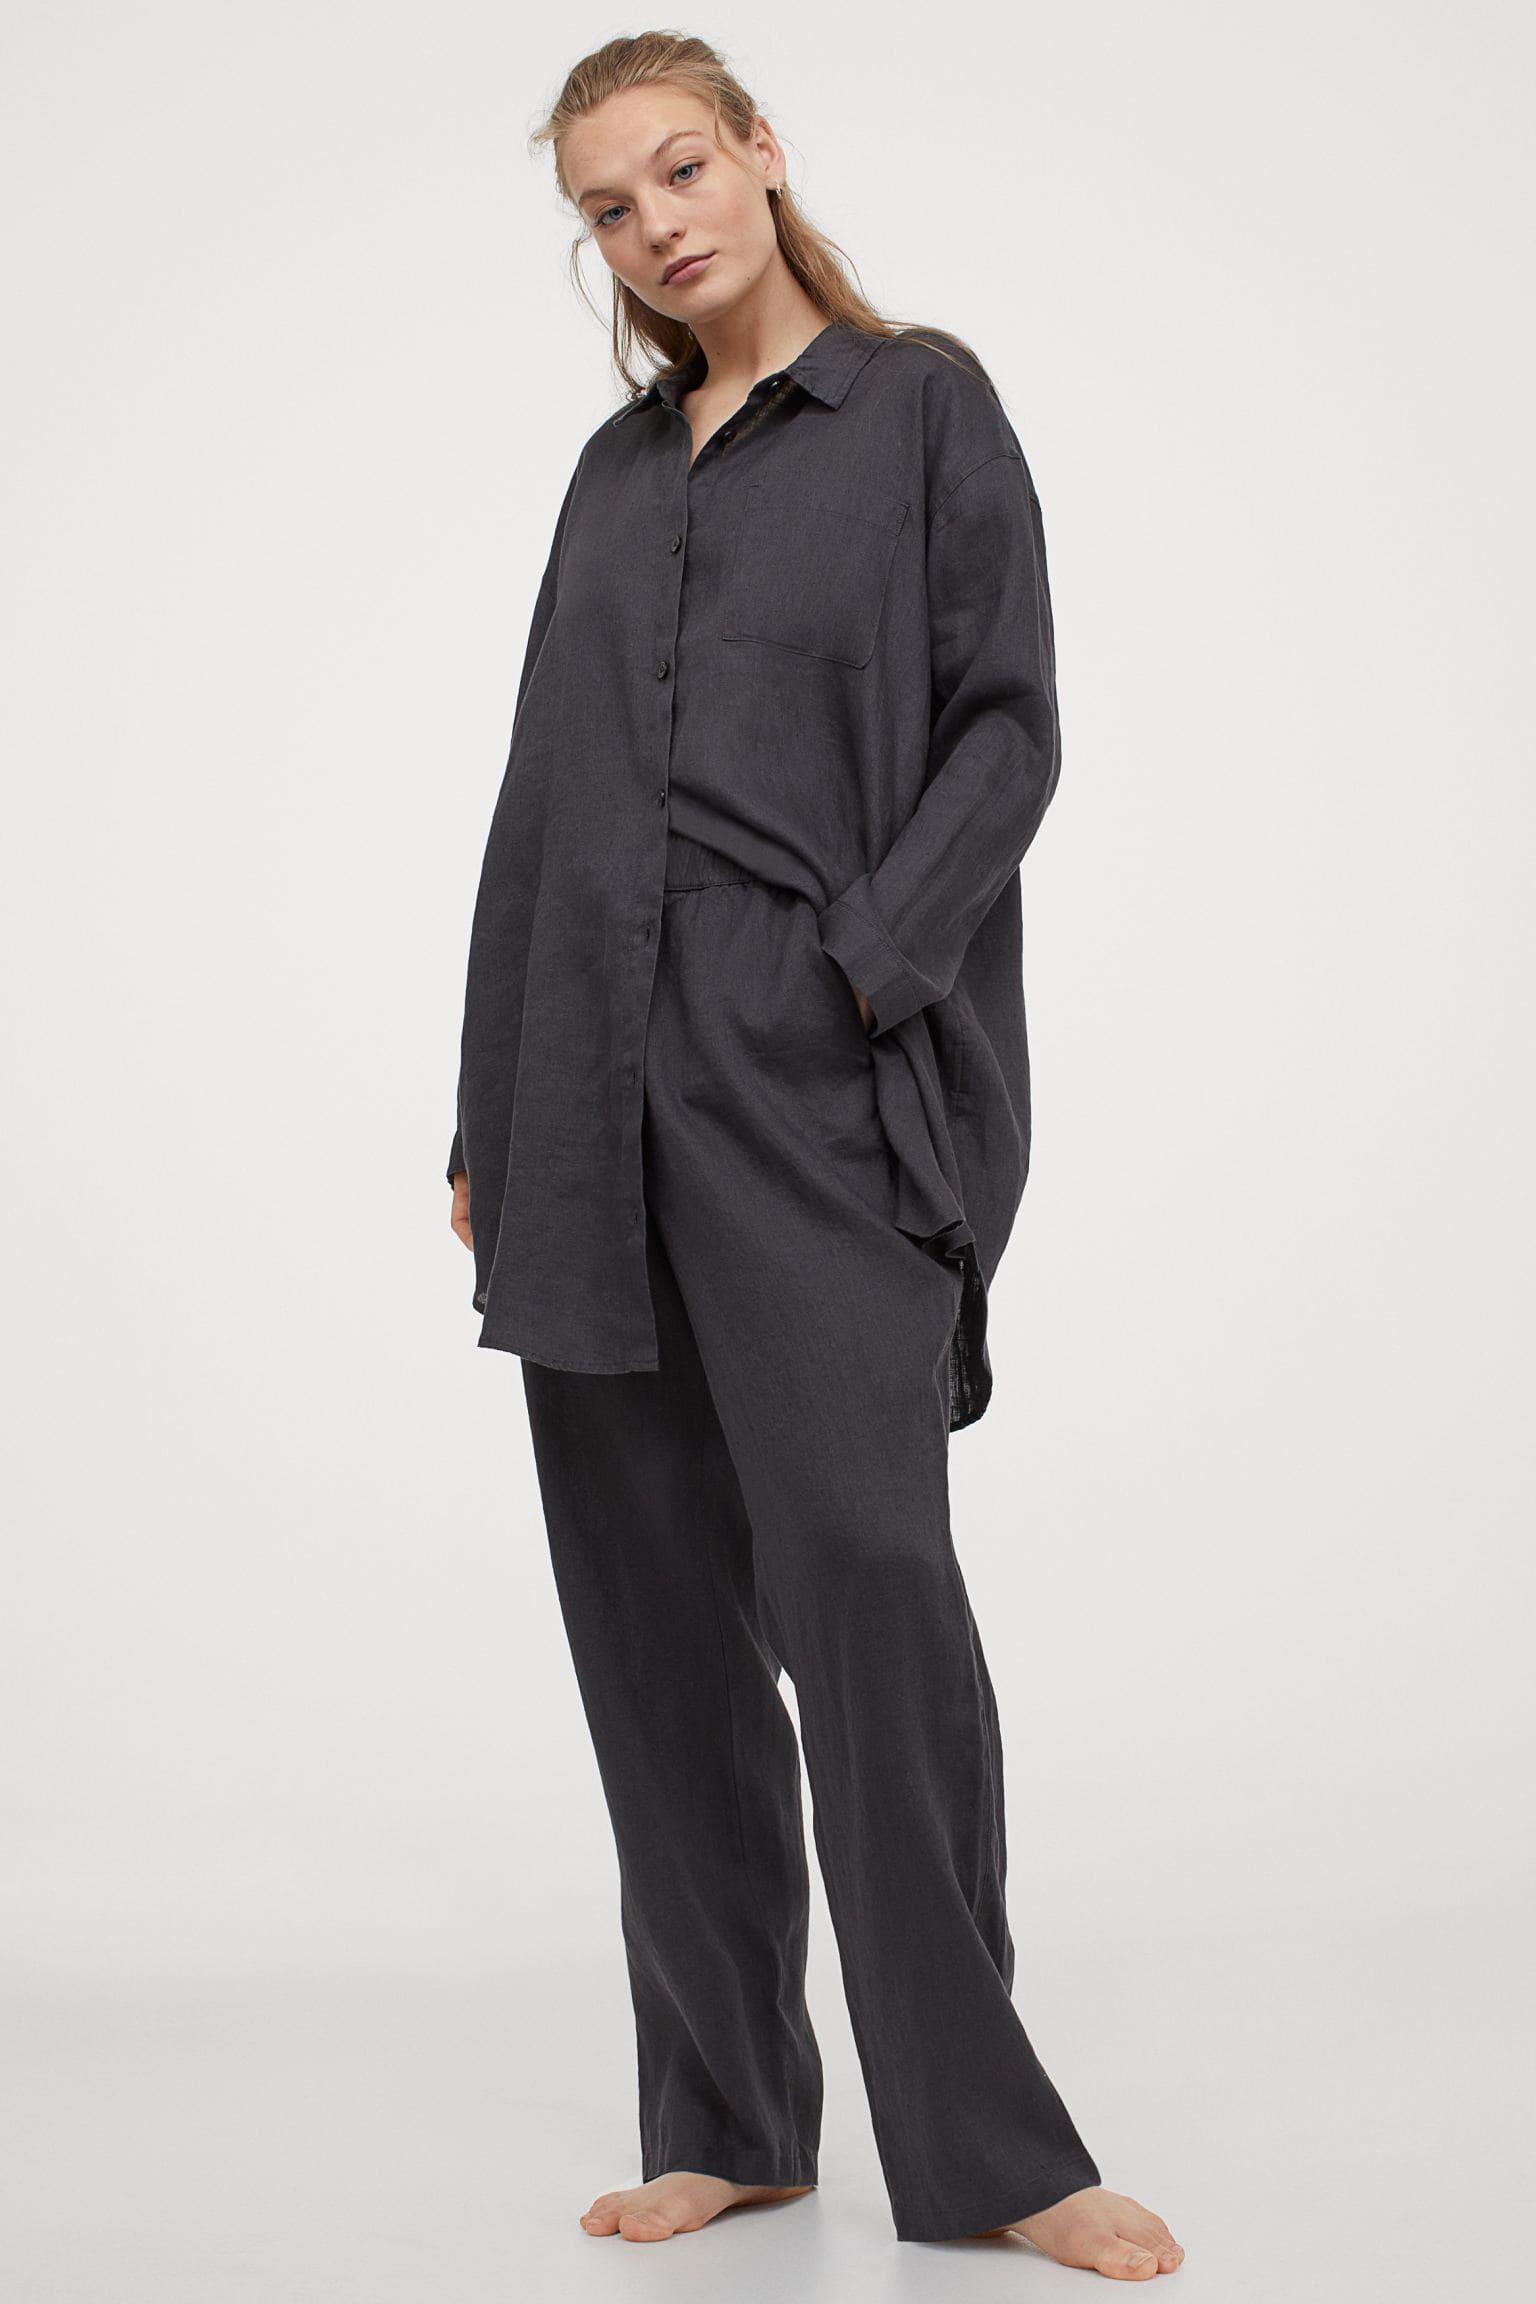 Grå / Svarta pyjamasbyxor i linne